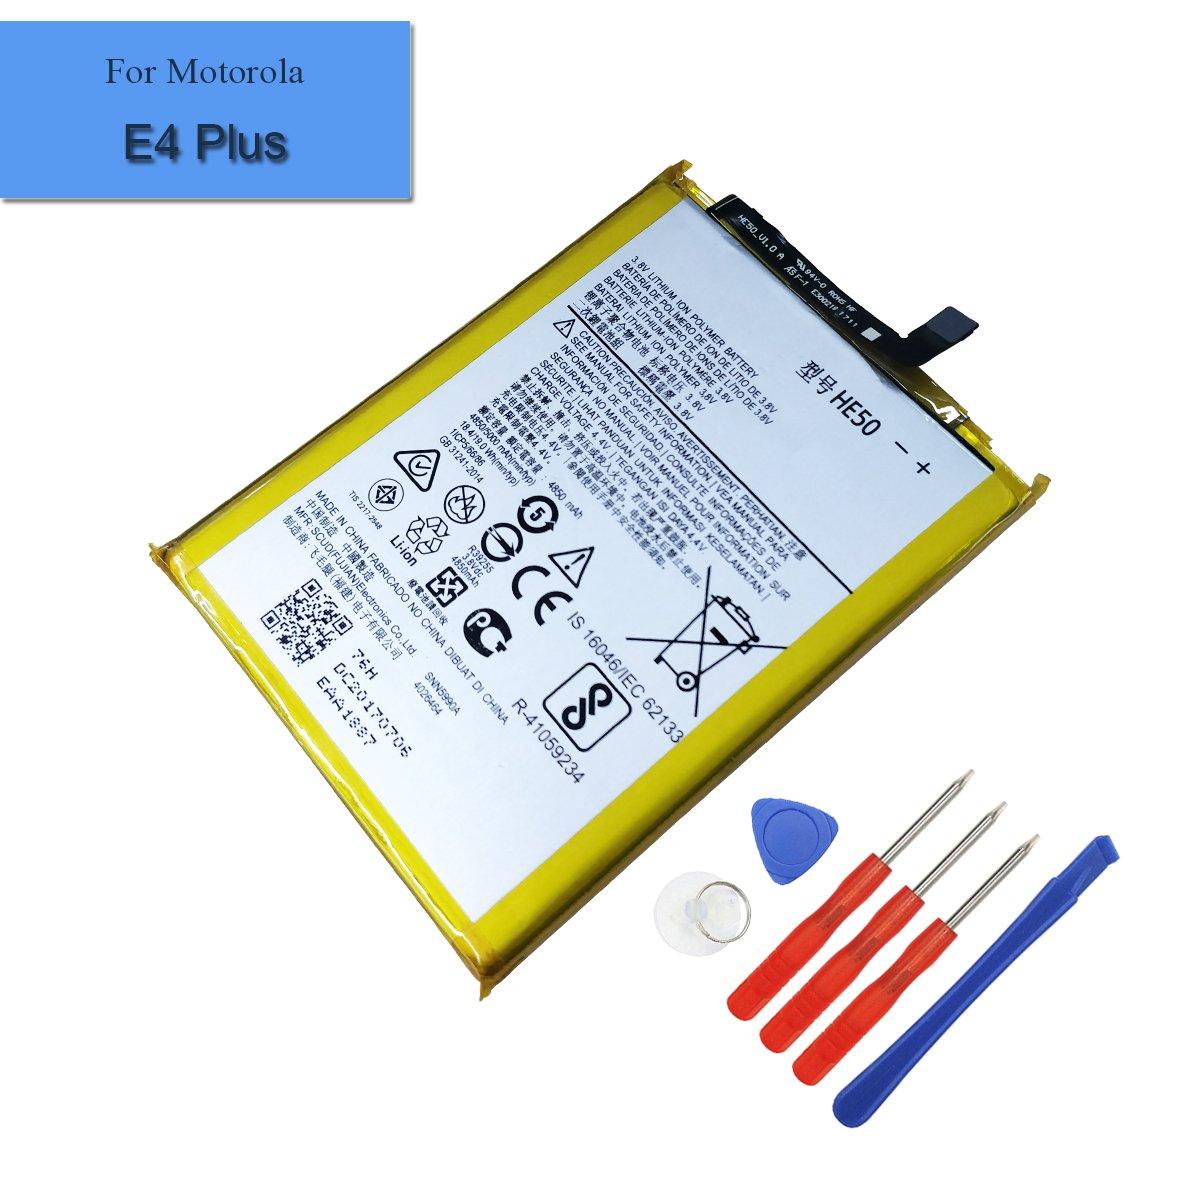 Bateria Celular Built In Compatible Con Motorola Moto E4 Plus Xt1770 Xt1775 Xt1776 Snn5990a 4850mah 3.8v He50